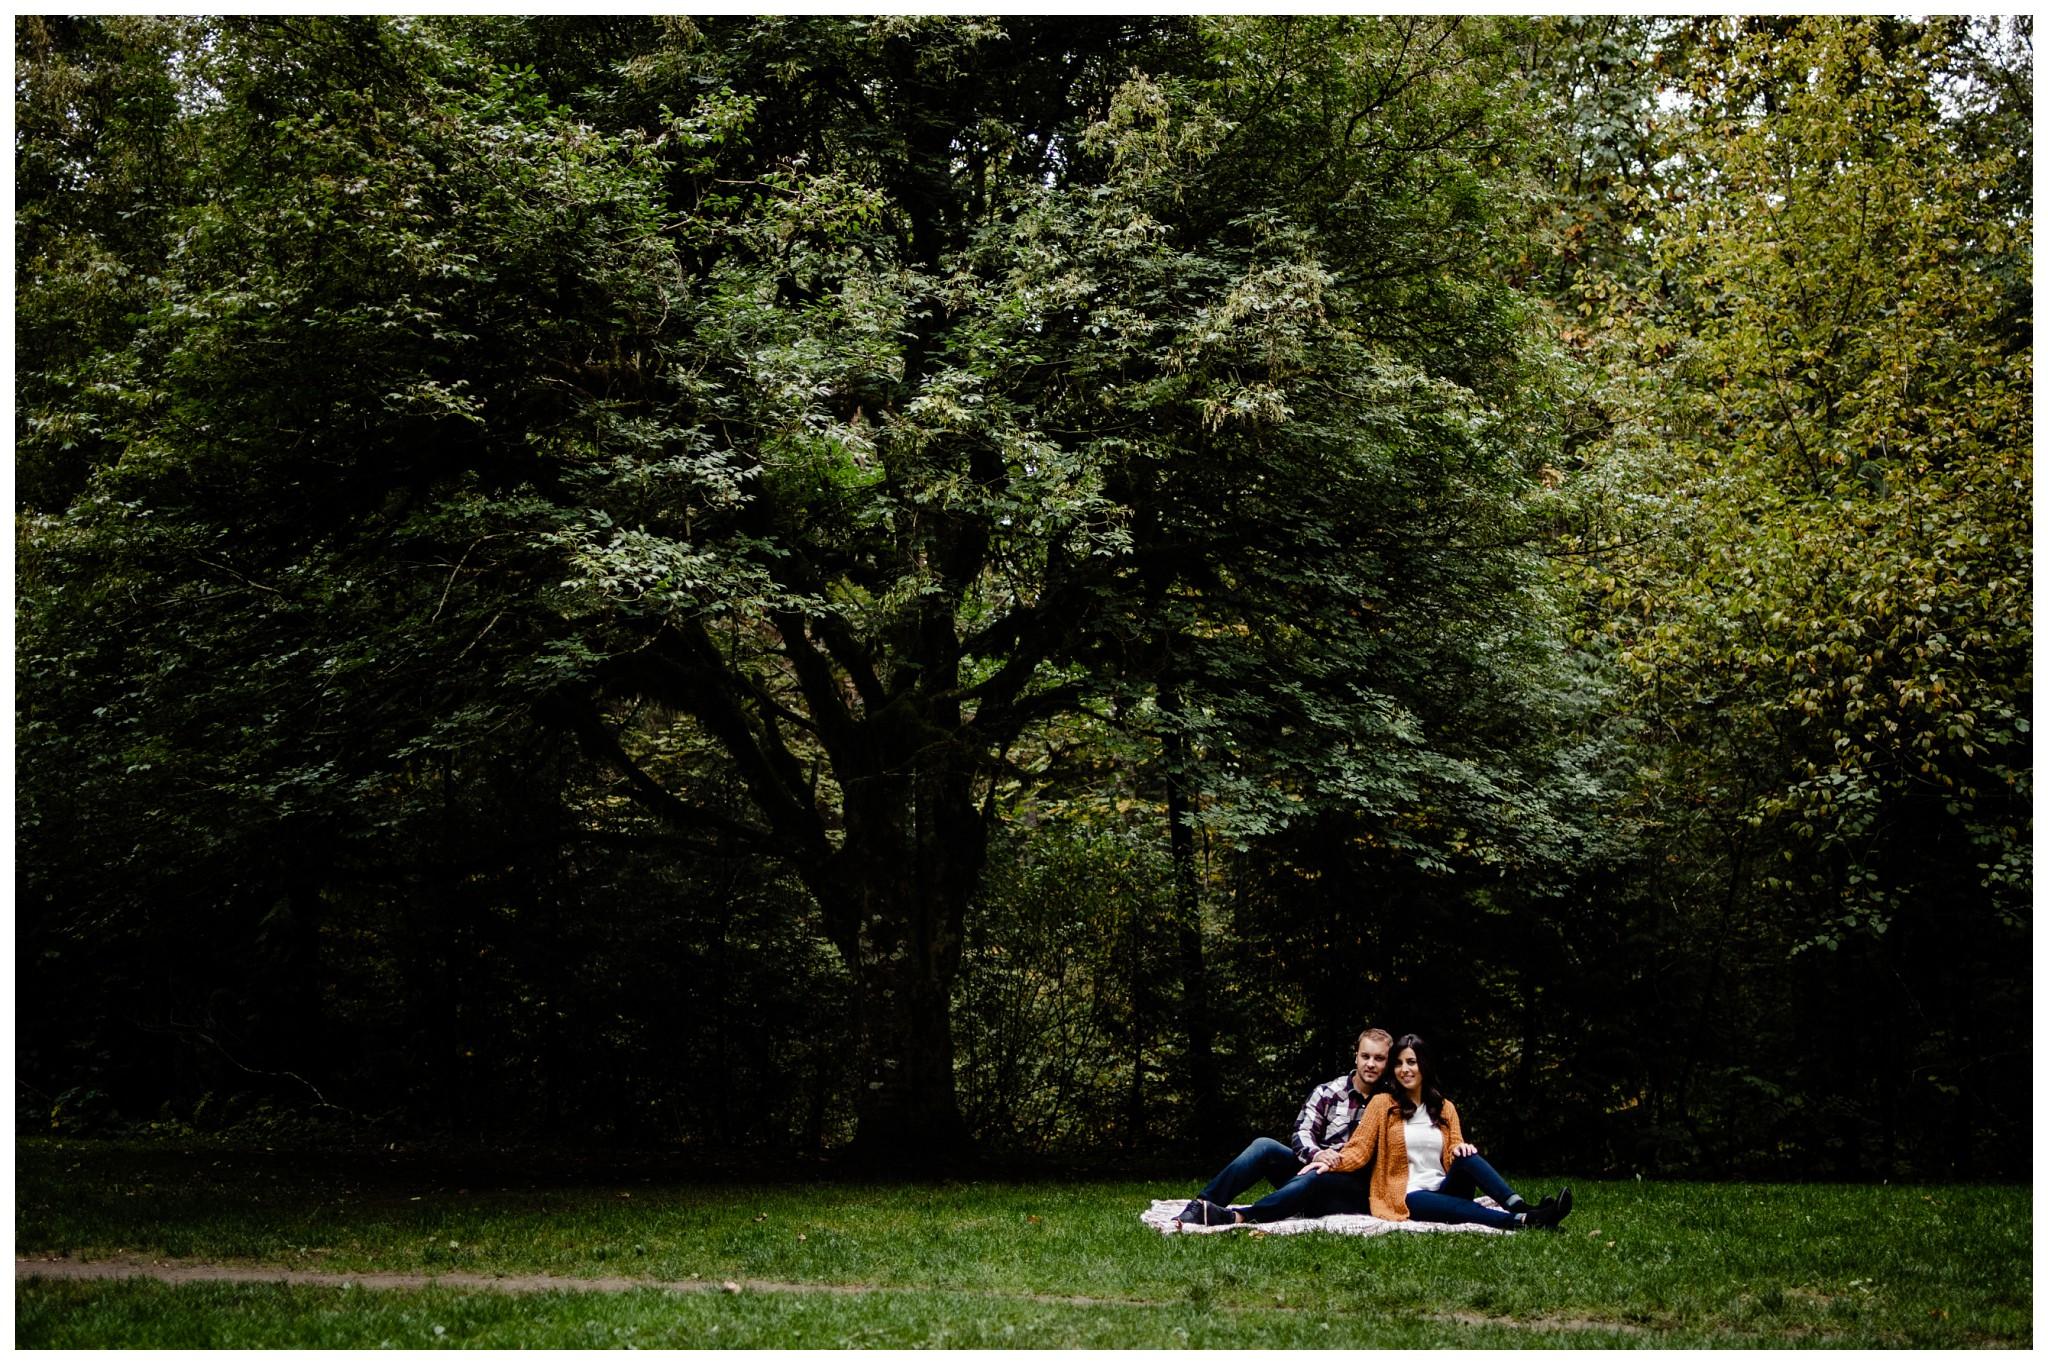 Williams Park Aldergrove Engagement Photographer Moody Fall Couple River Water Romantic Pose Yellow Leaves White Dress Dark_0031.jpg